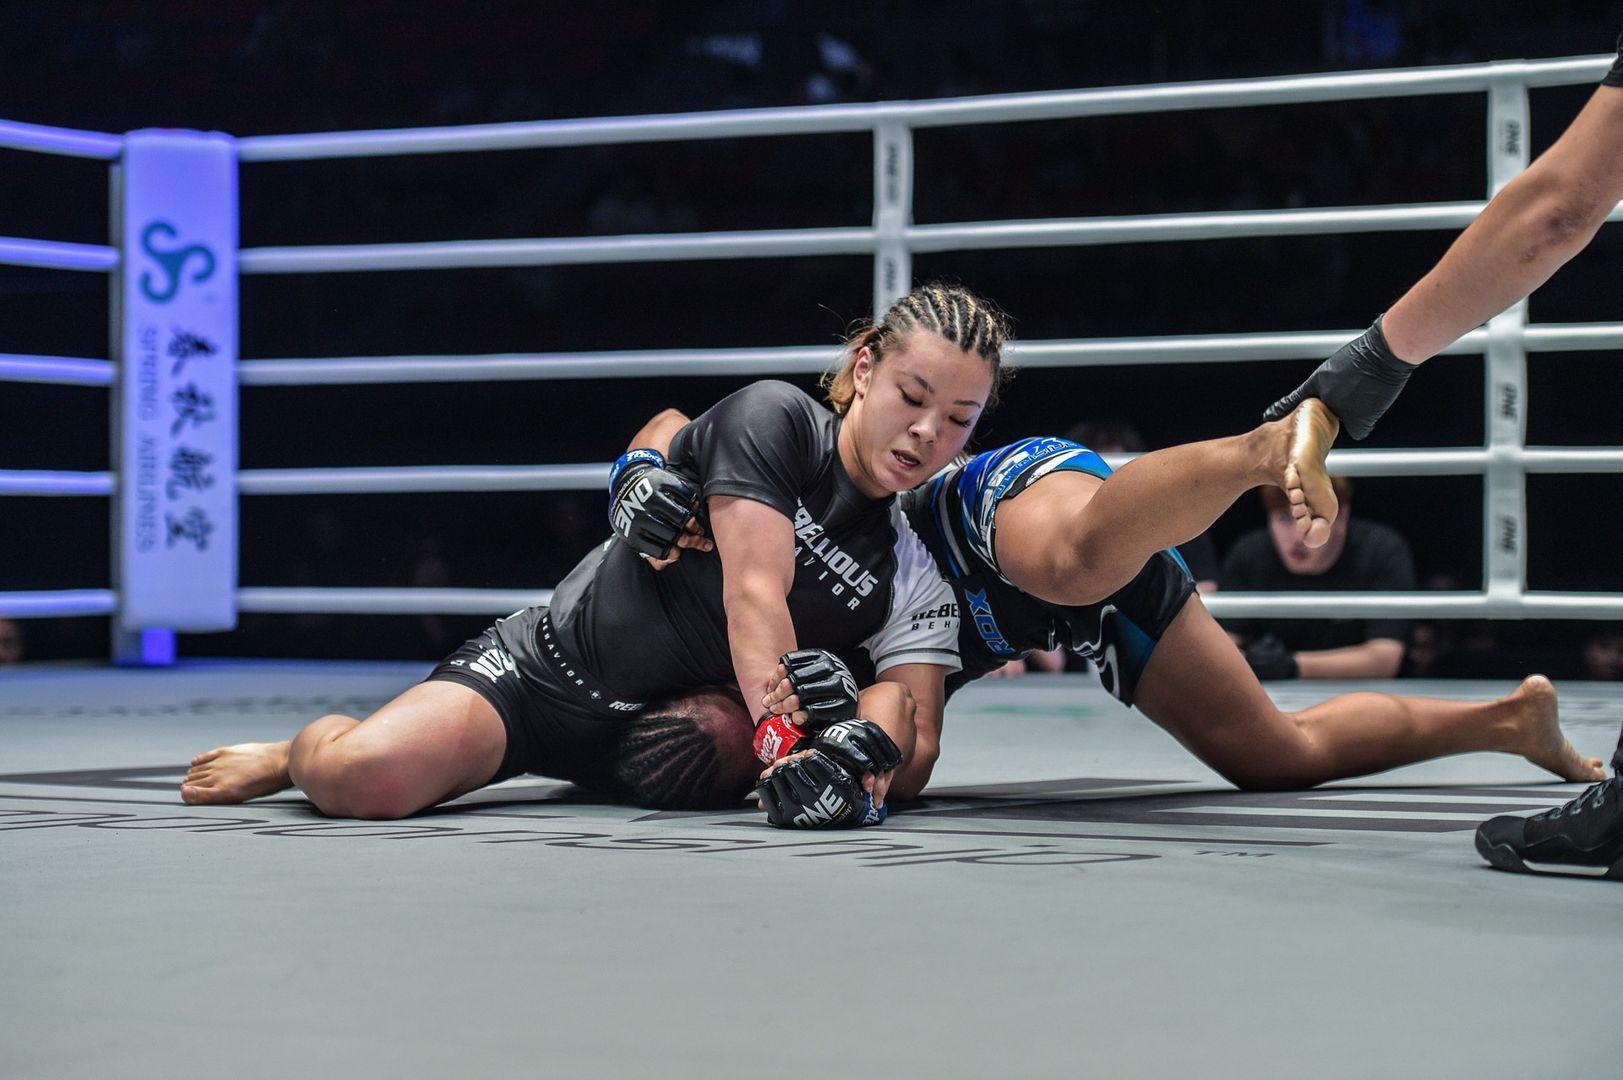 Itsuki Hirata submits Angelie Sabanal via Americana